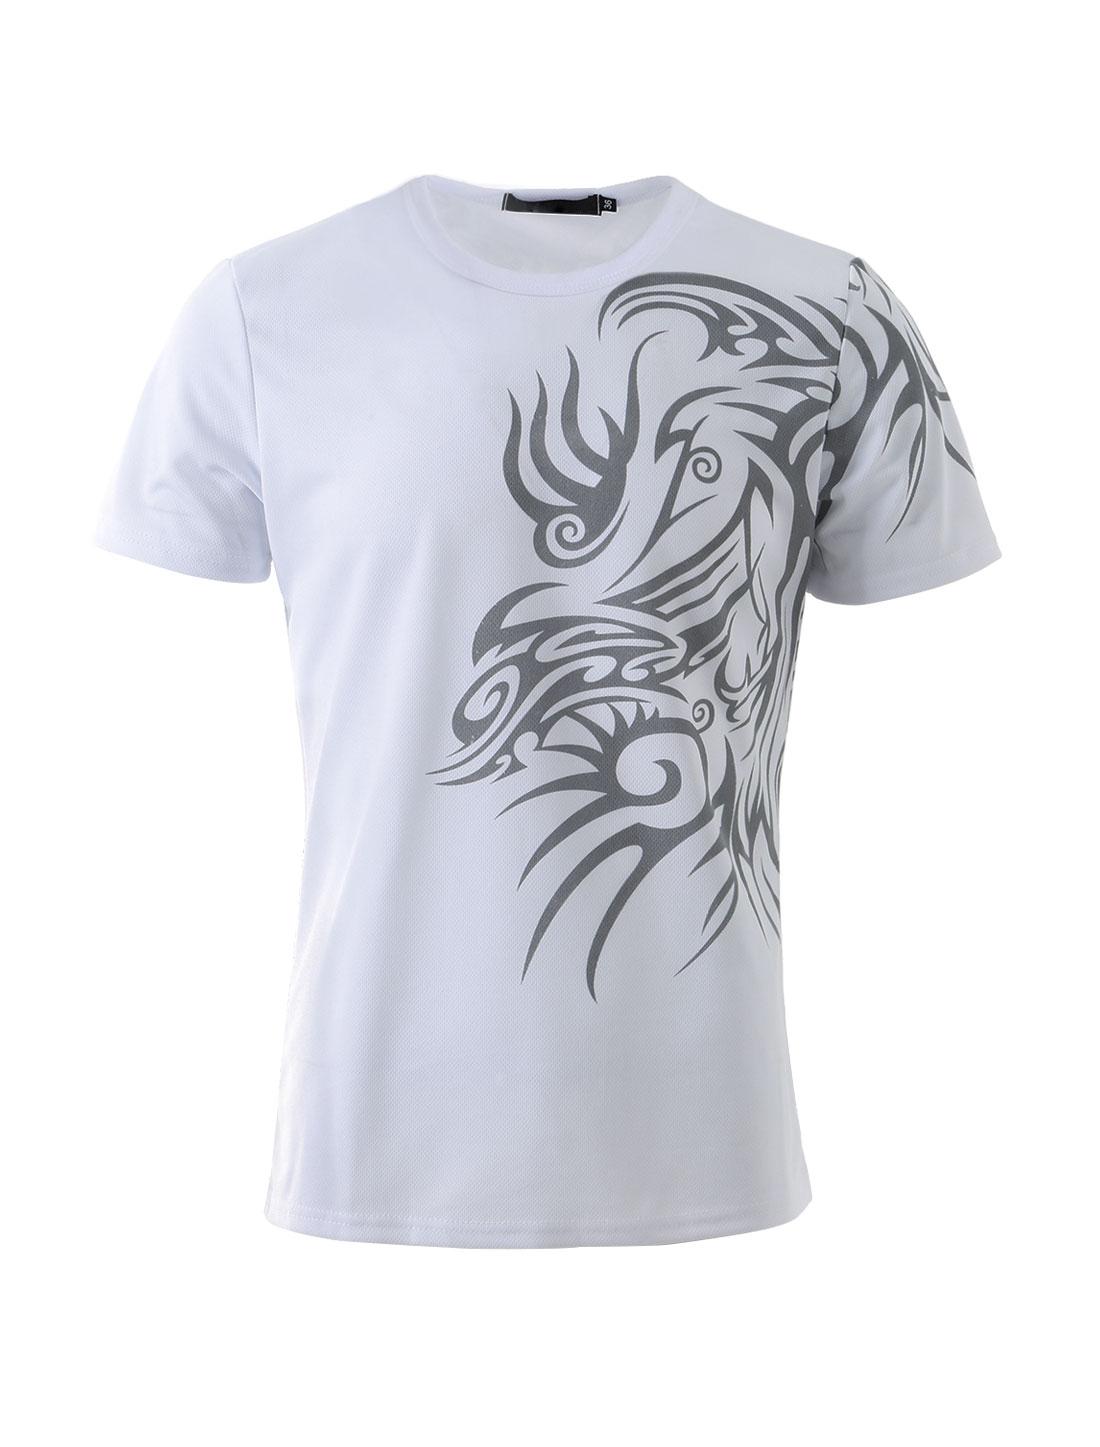 Men Round Neck Short Sleeve Slim Fit Tribal Print Casual T Shirt White S